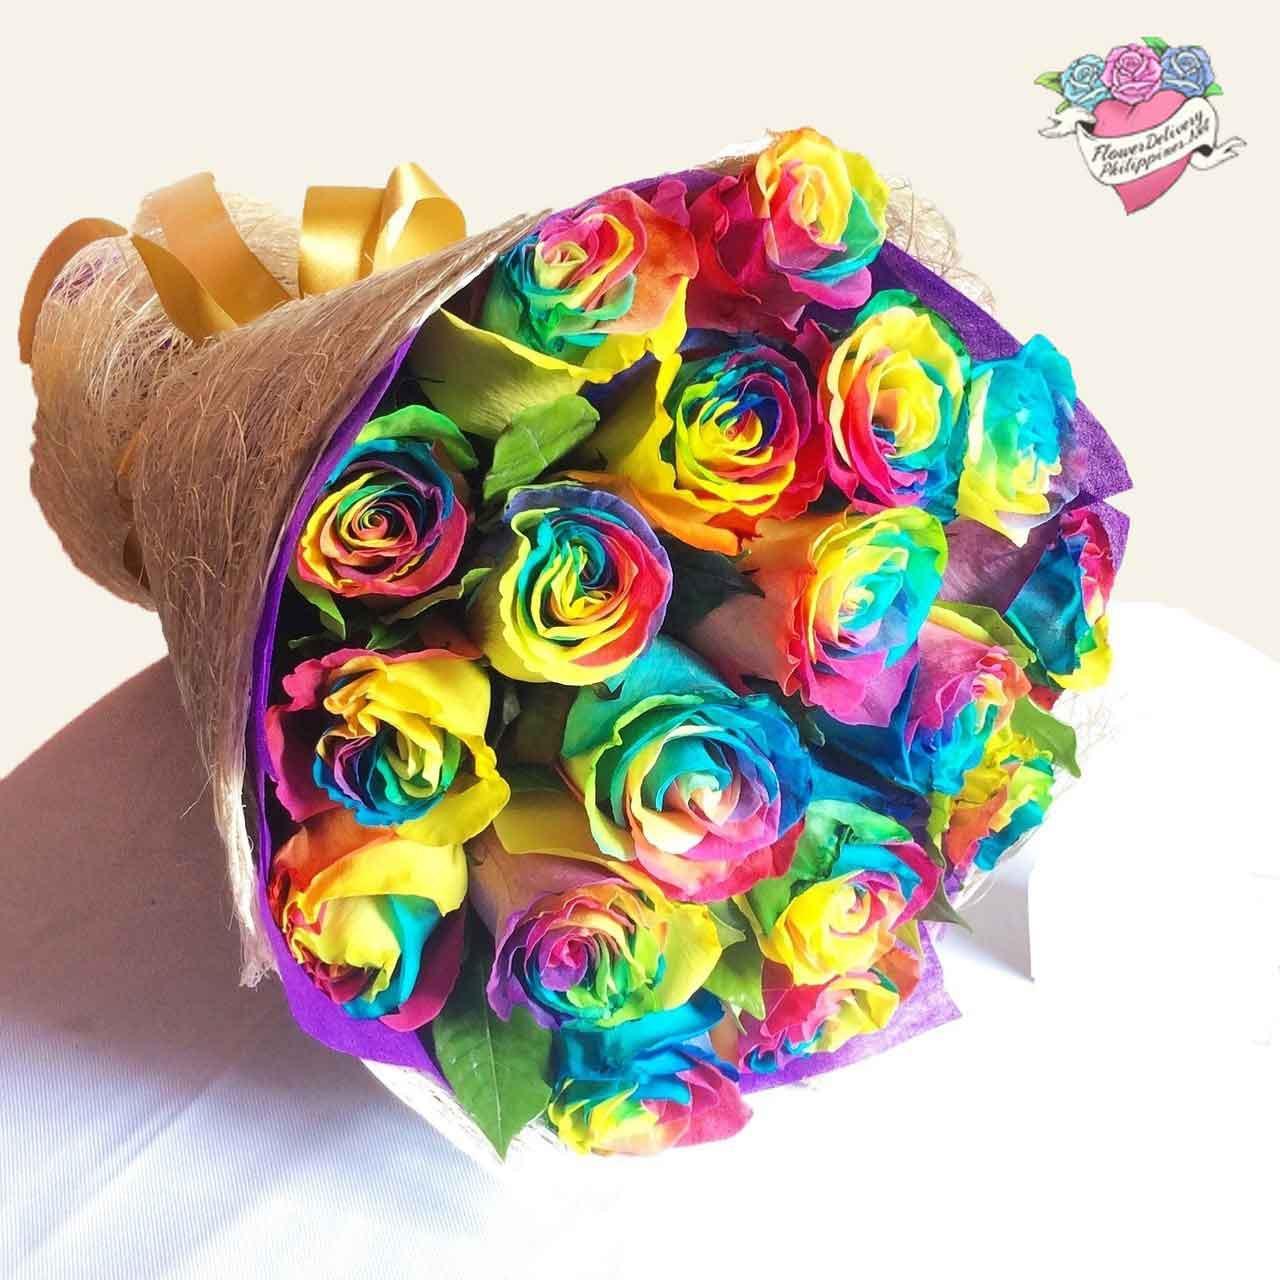 12 Rainbow Ecuadorian Roses